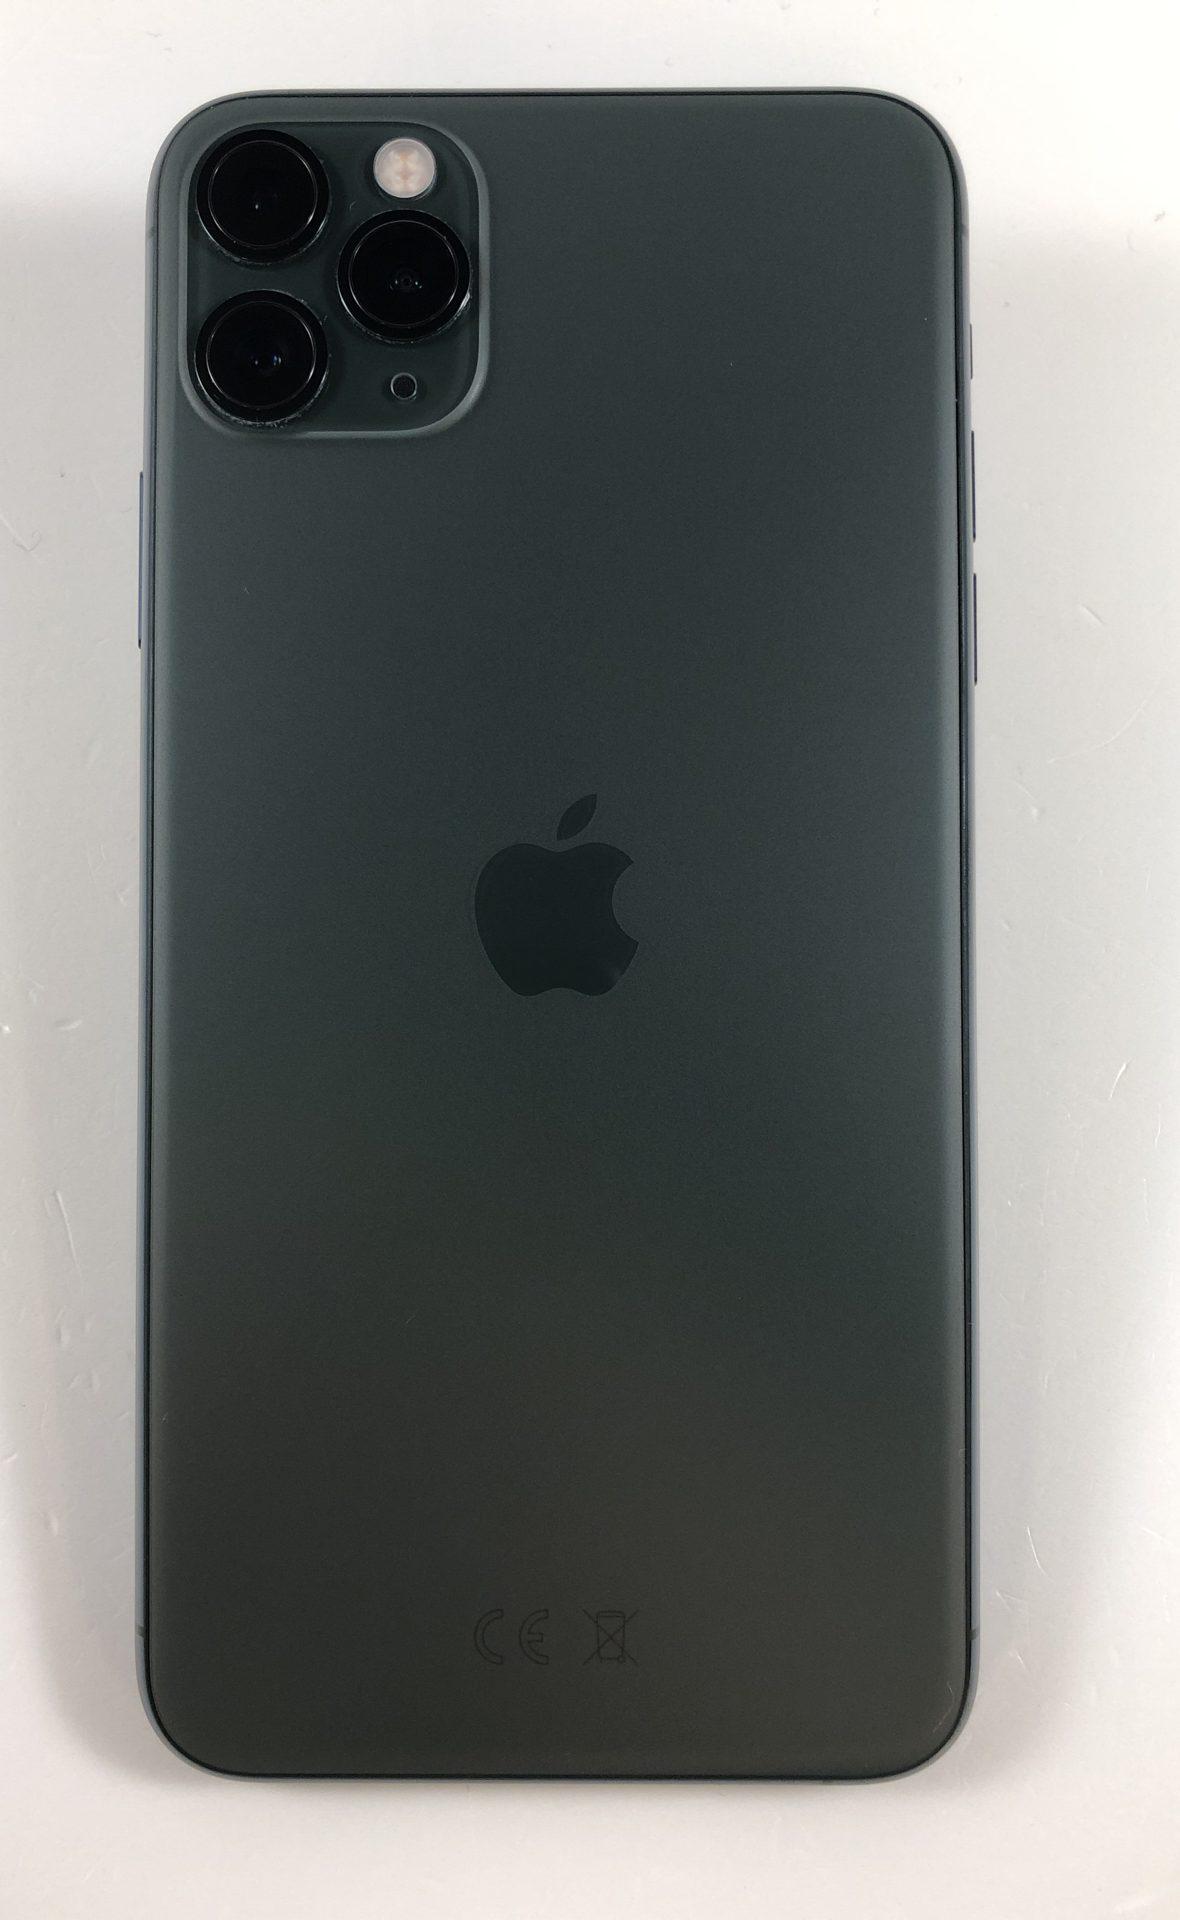 iPhone 11 Pro Max 64GB, 64GB, Midnight Green, imagen 2